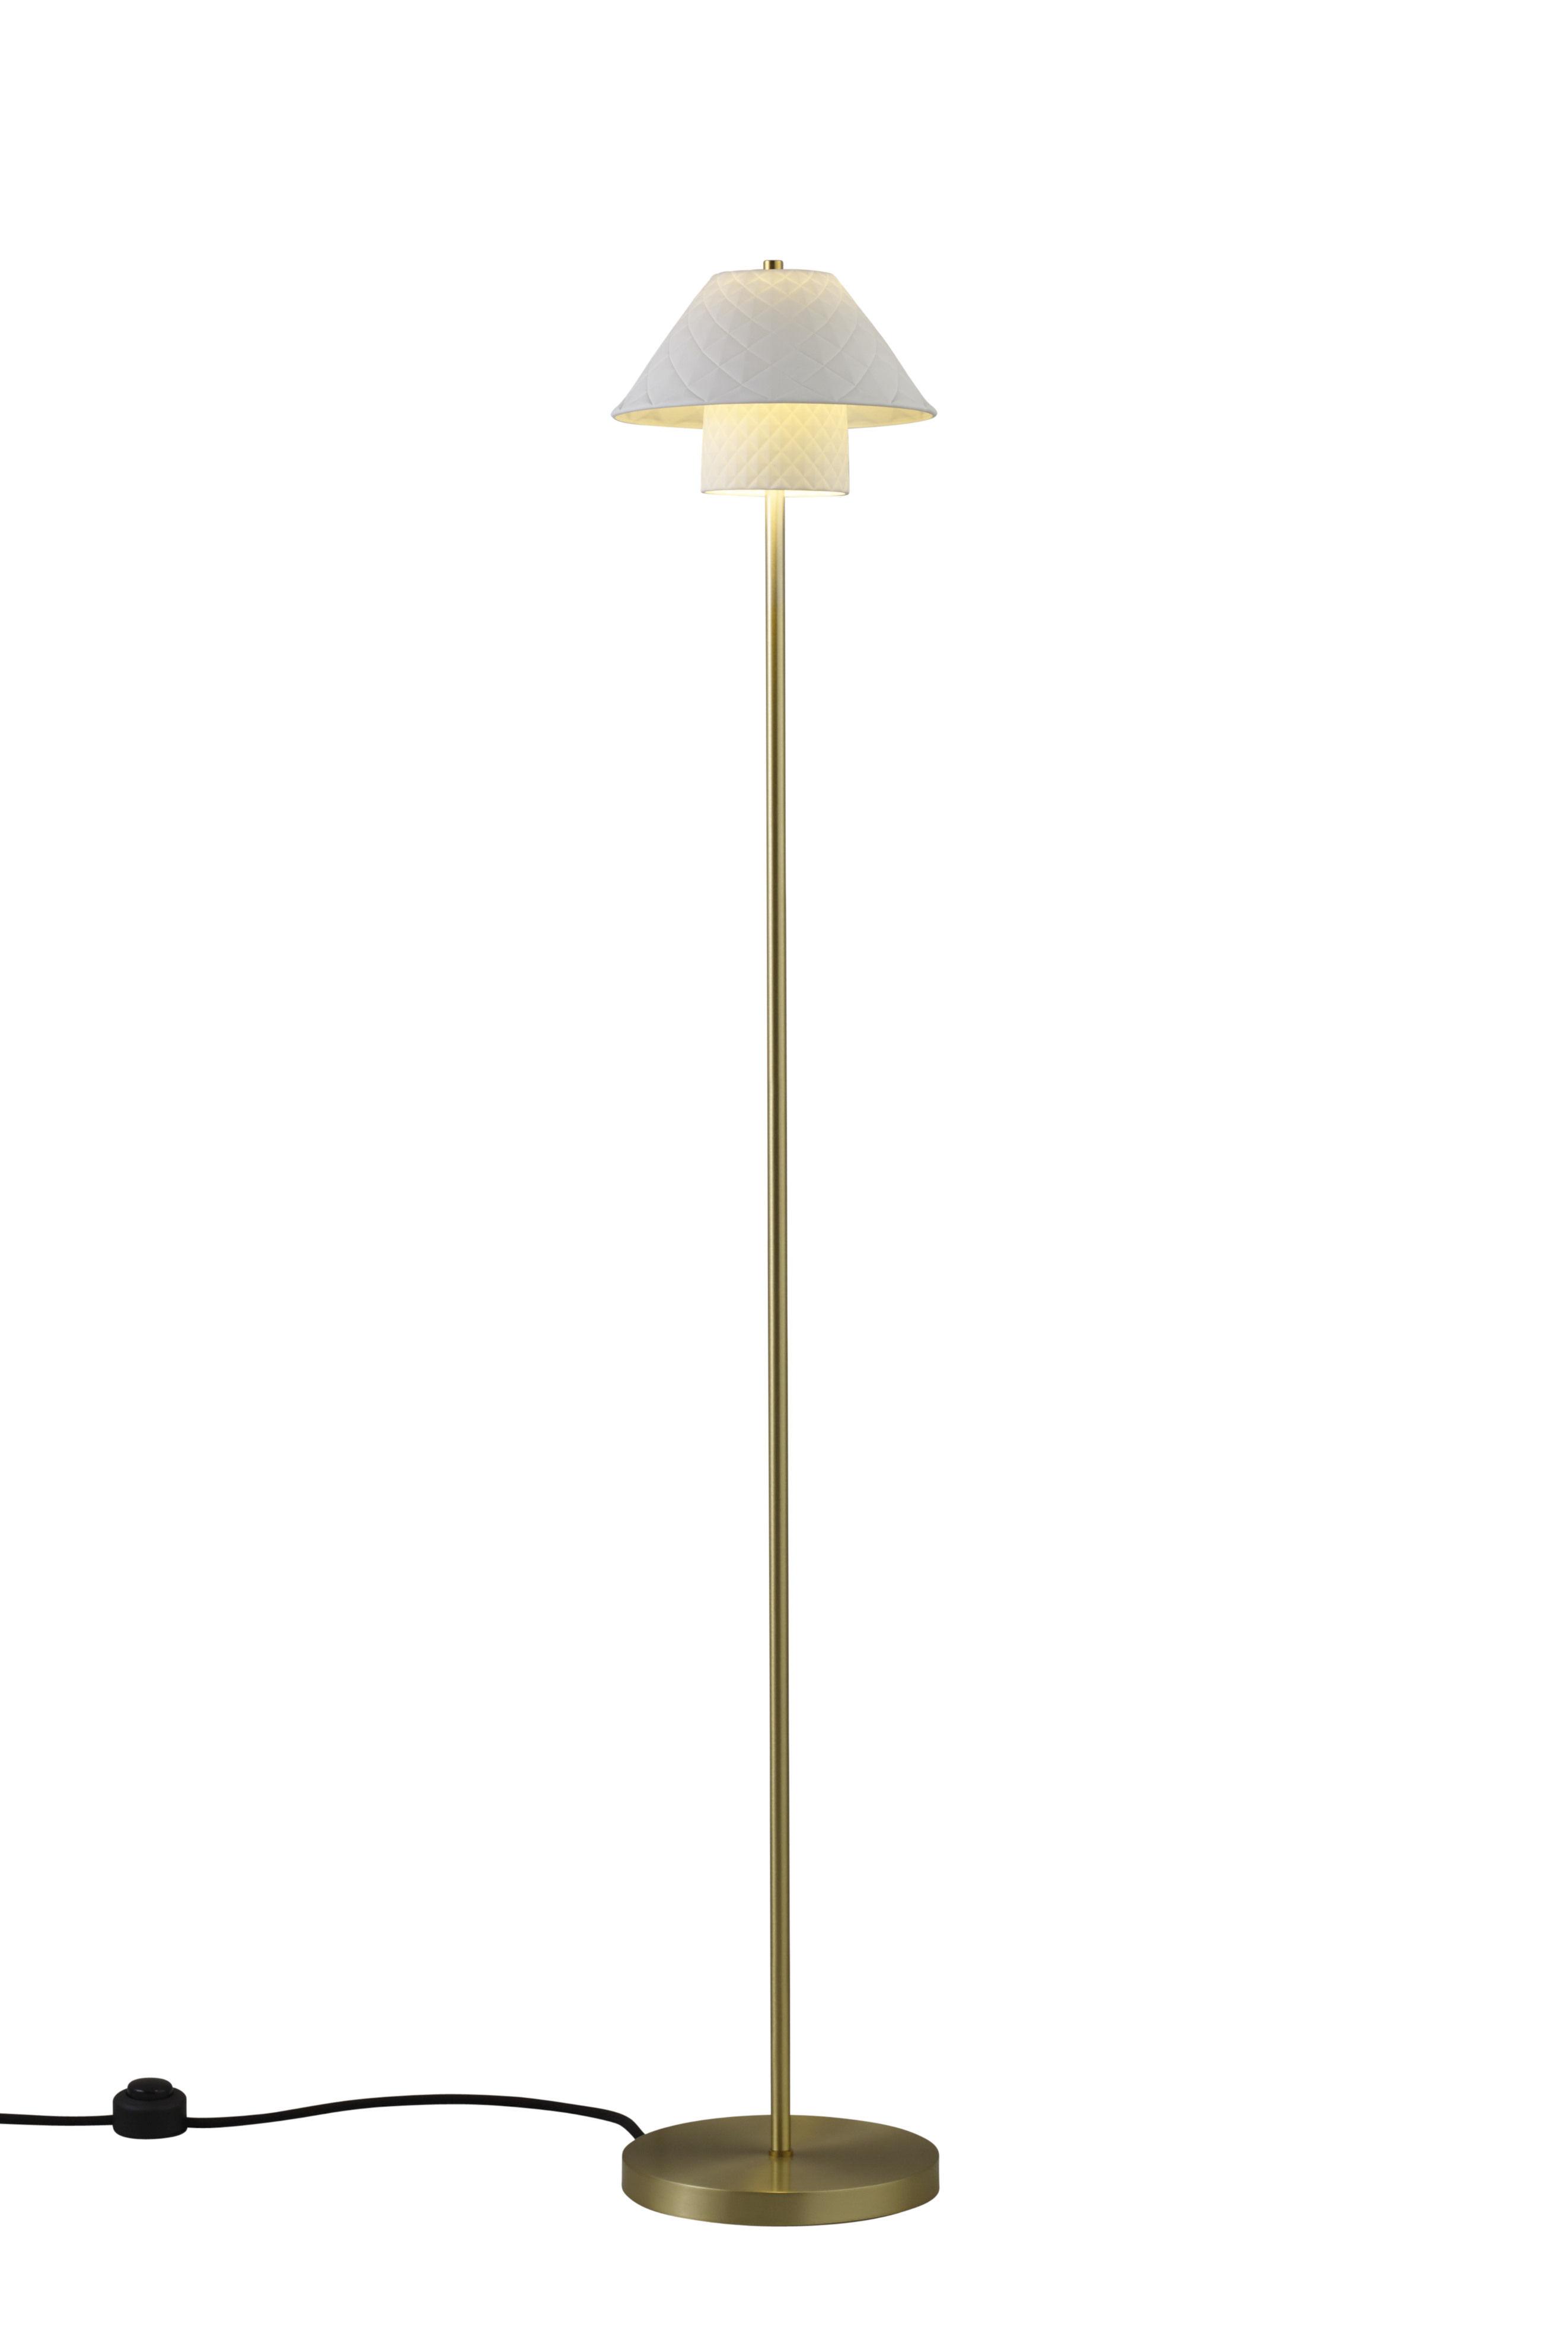 lampadaire oxford double laiton satin porcelaine blanc mat laiton satin original btc. Black Bedroom Furniture Sets. Home Design Ideas